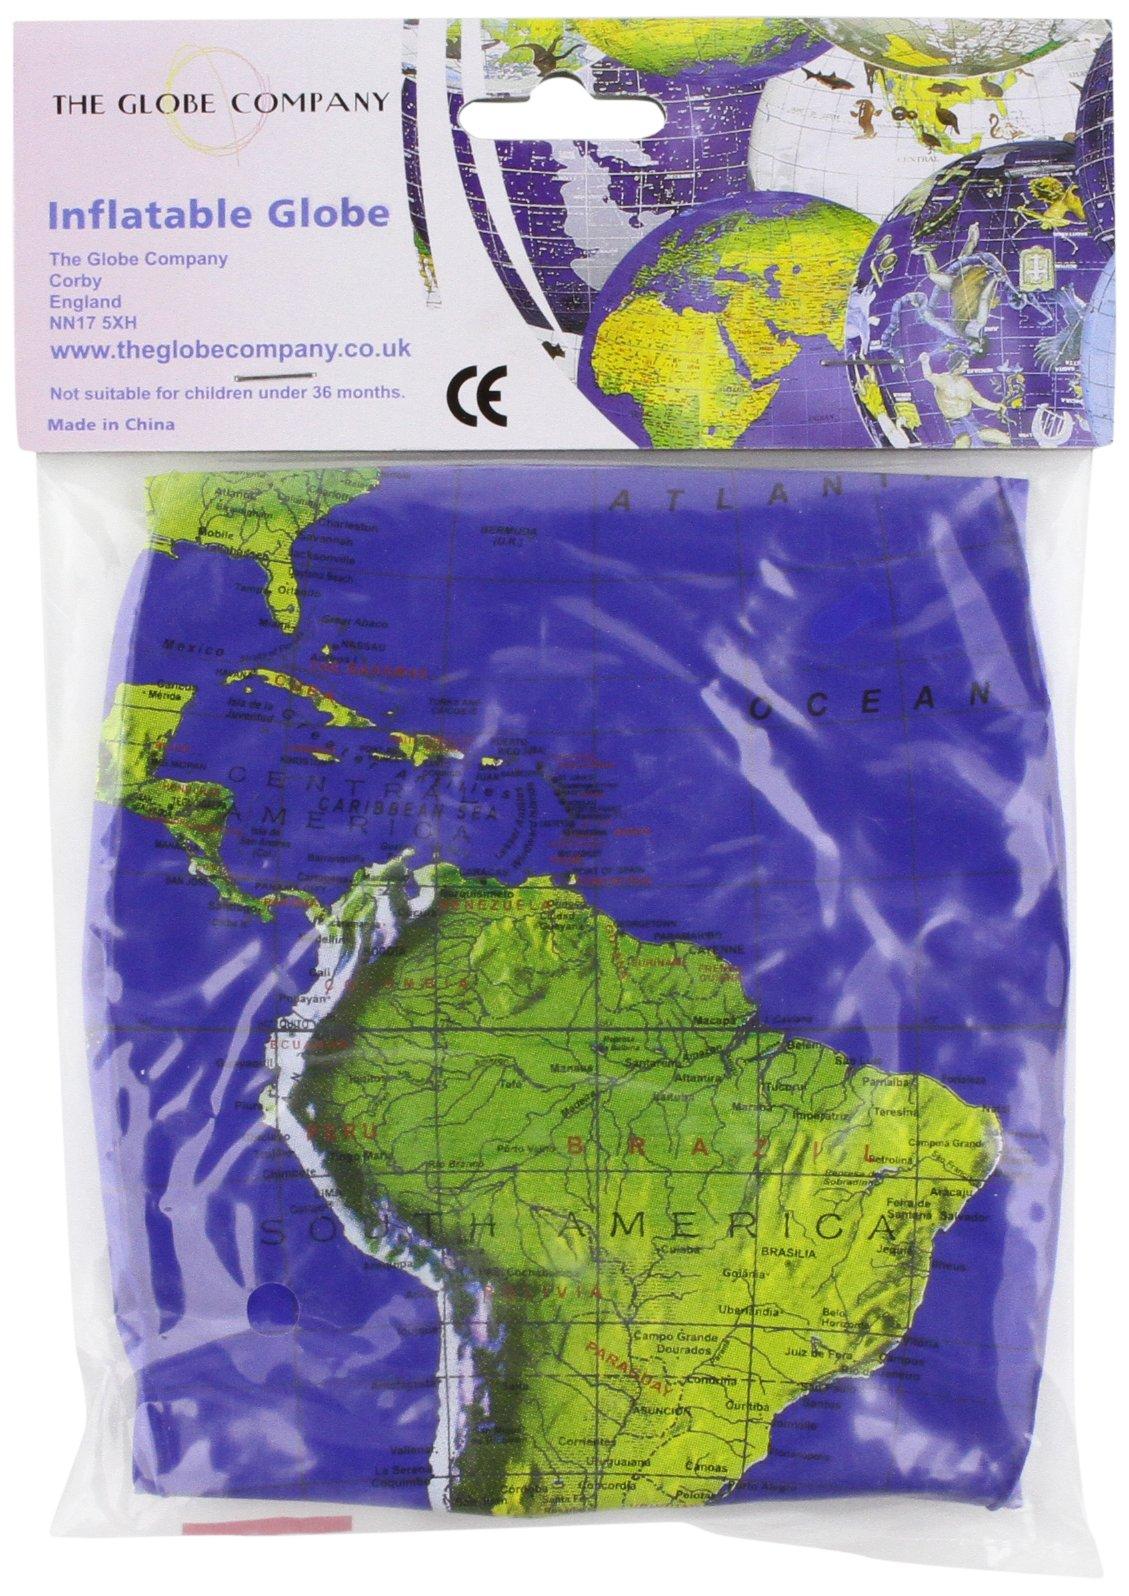 12 Dark Blue Topographical Inflatable Globe Map – Globe, 1 Jun 2013 Harry Styles C.G.E. World Globes Limited 190955801X Geografie